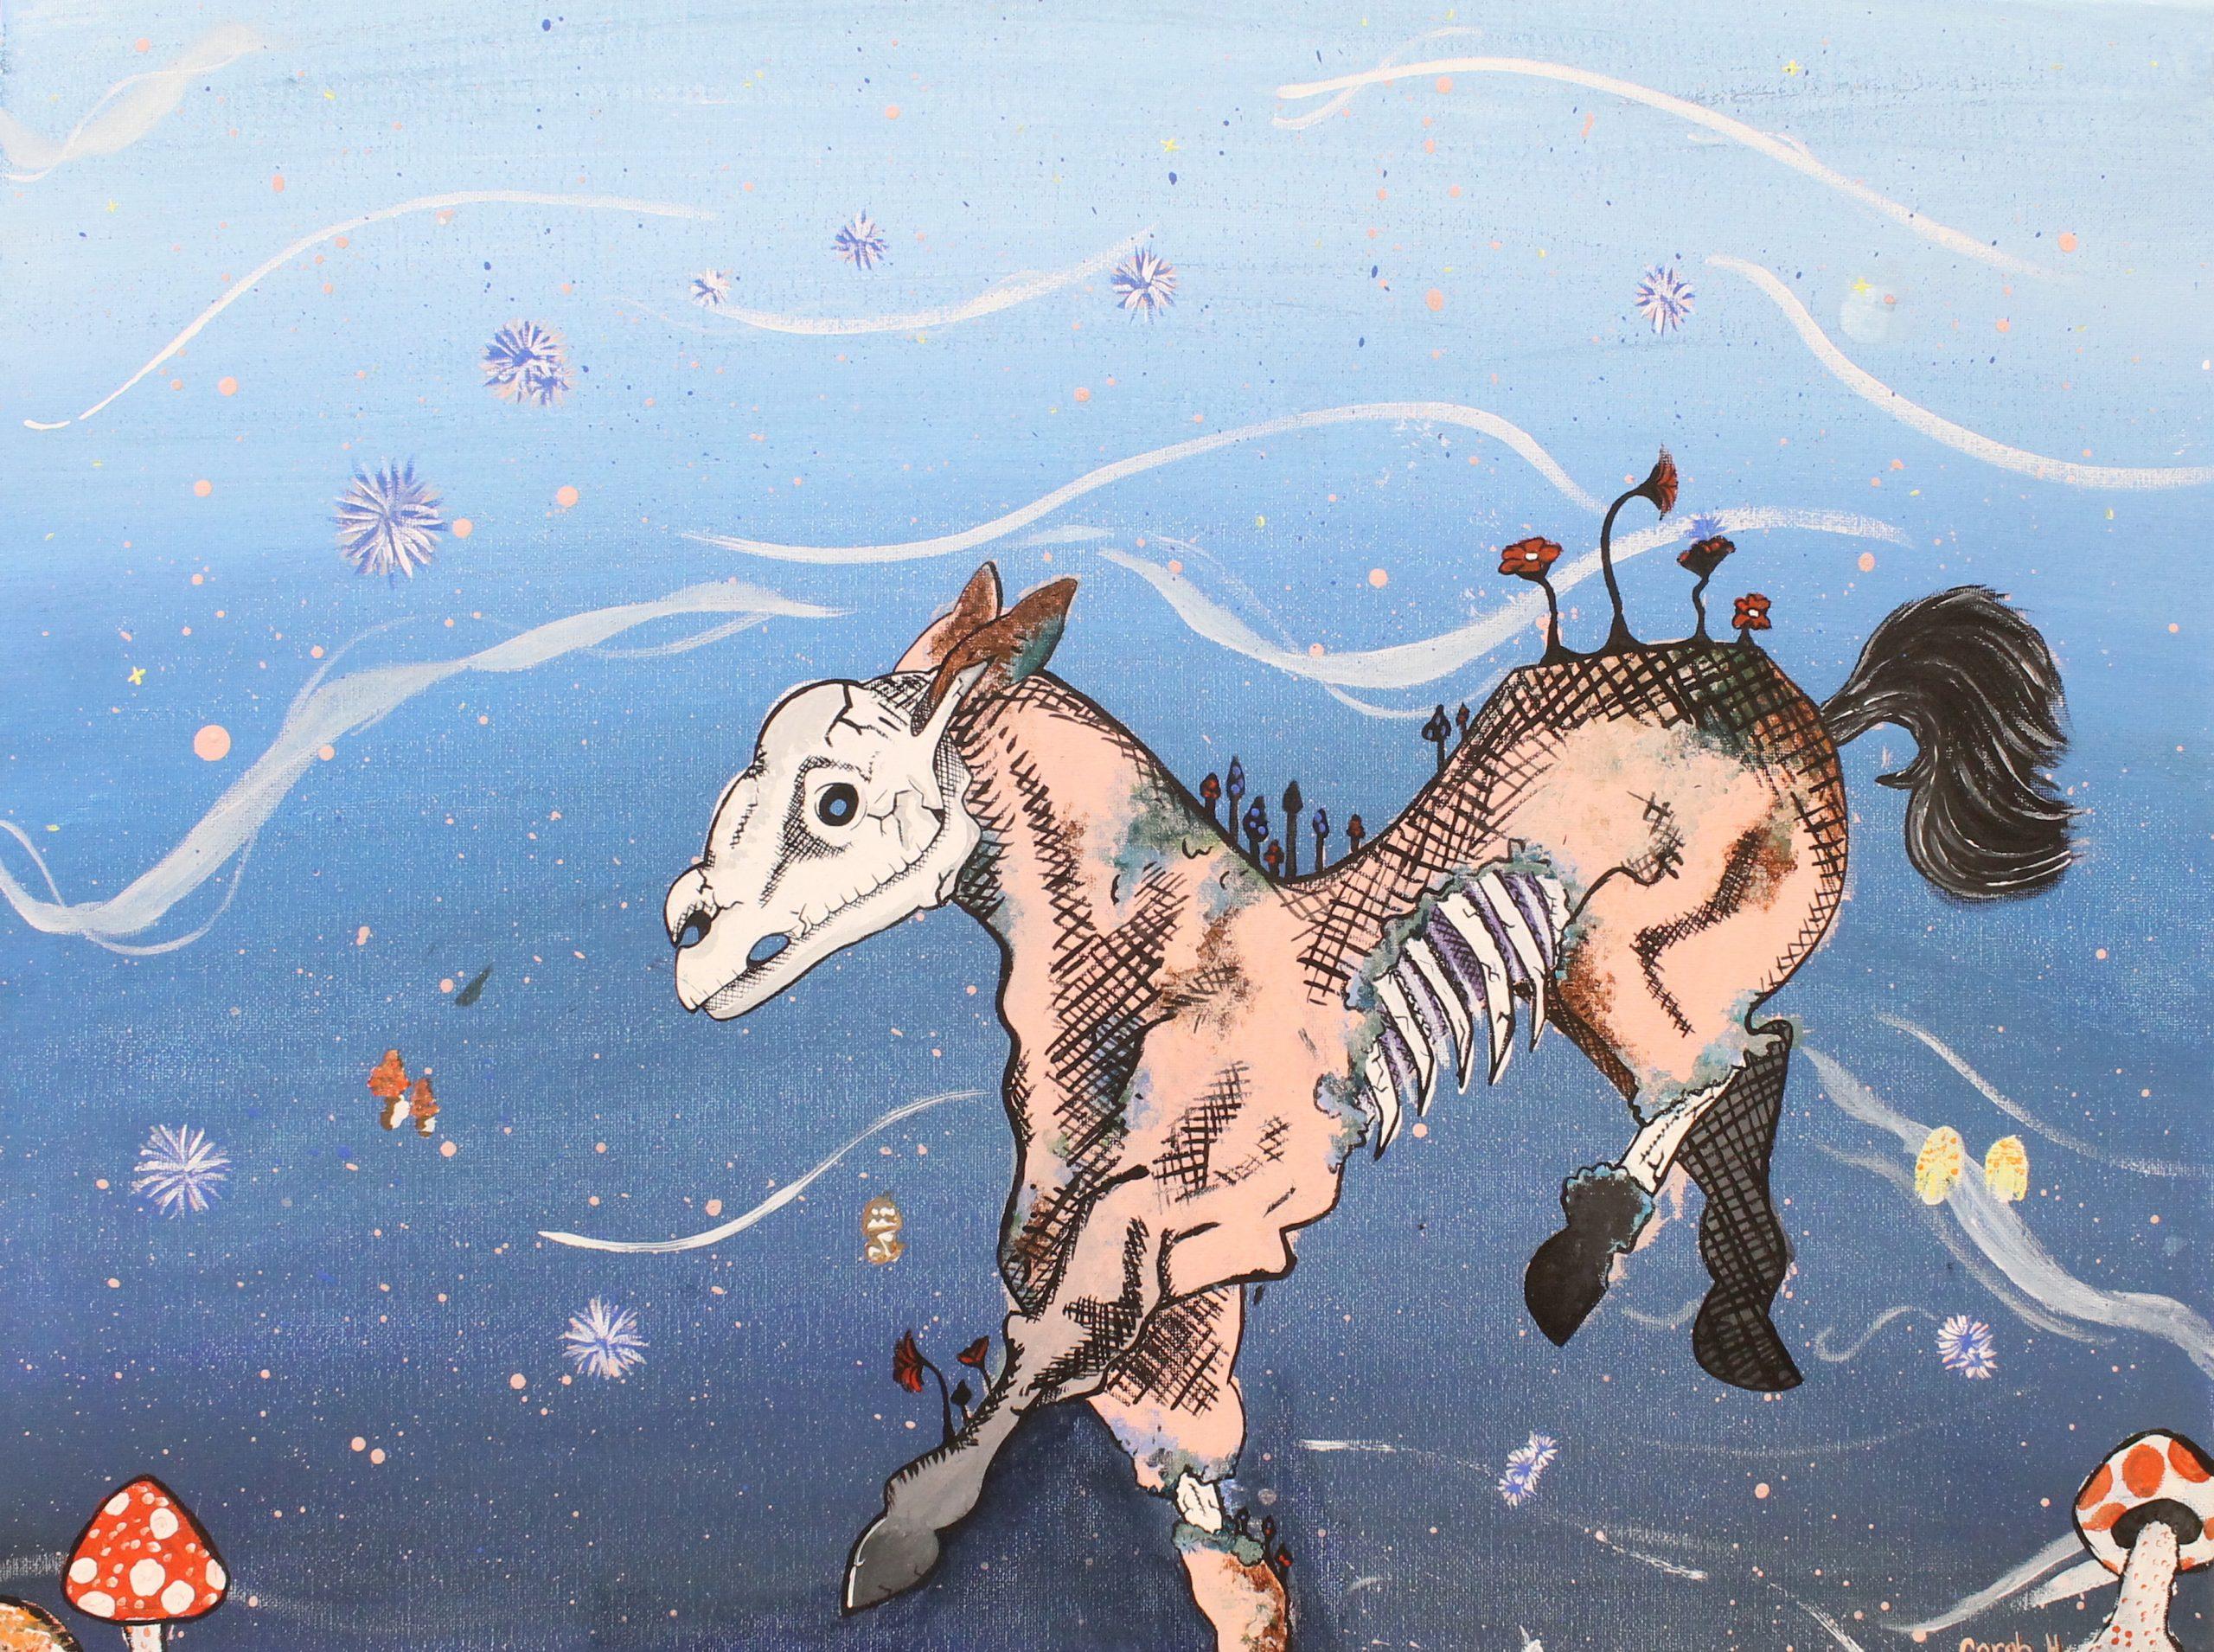 Of the Four Horseman, Death